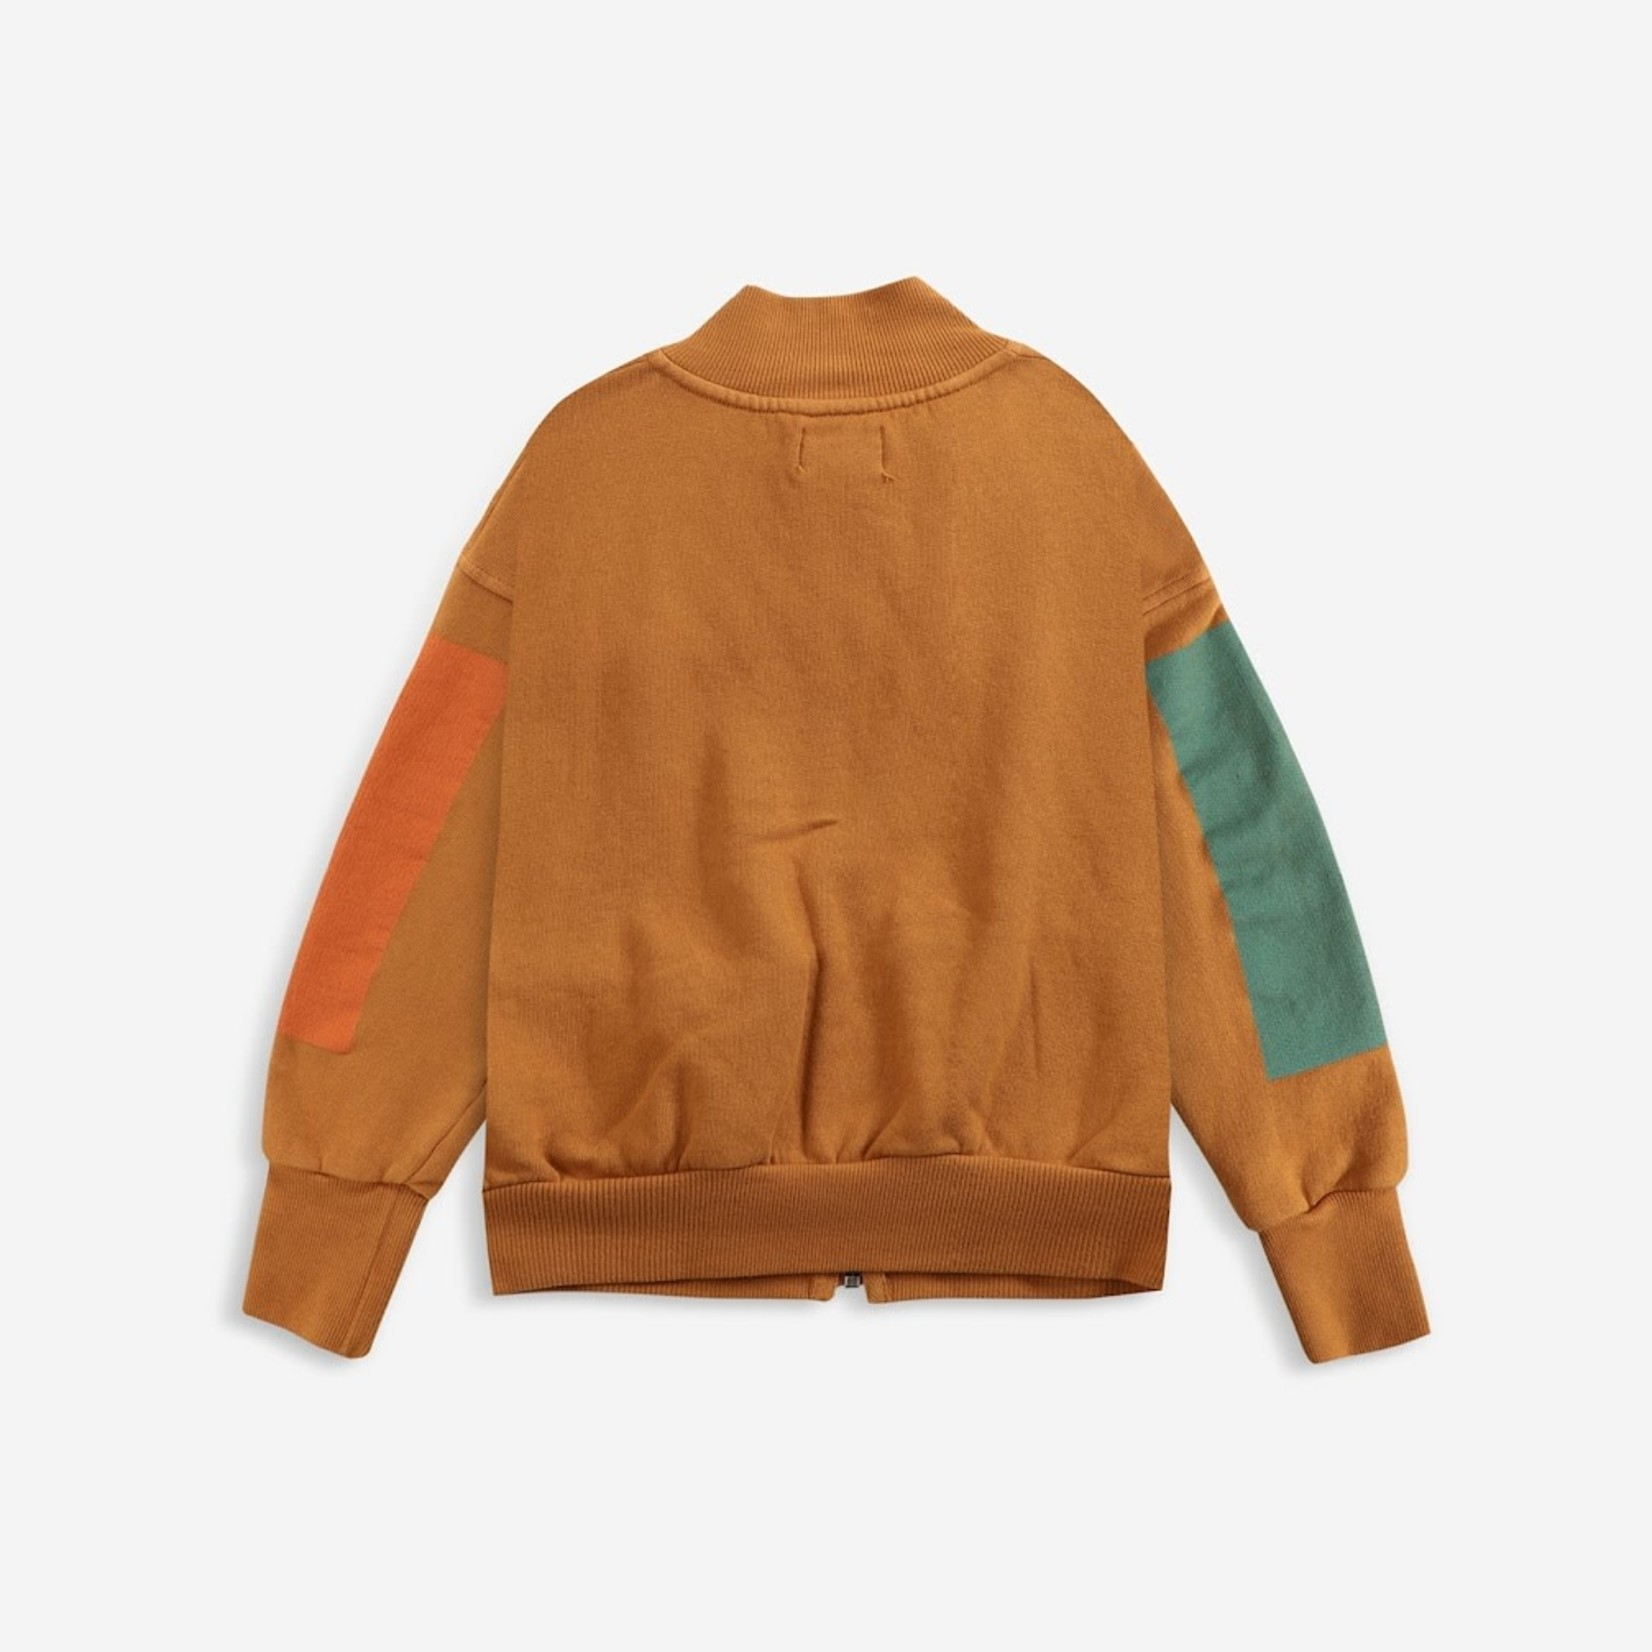 BOBO CHOSES BOBO CHOSES Geometric zipped sweatshirt